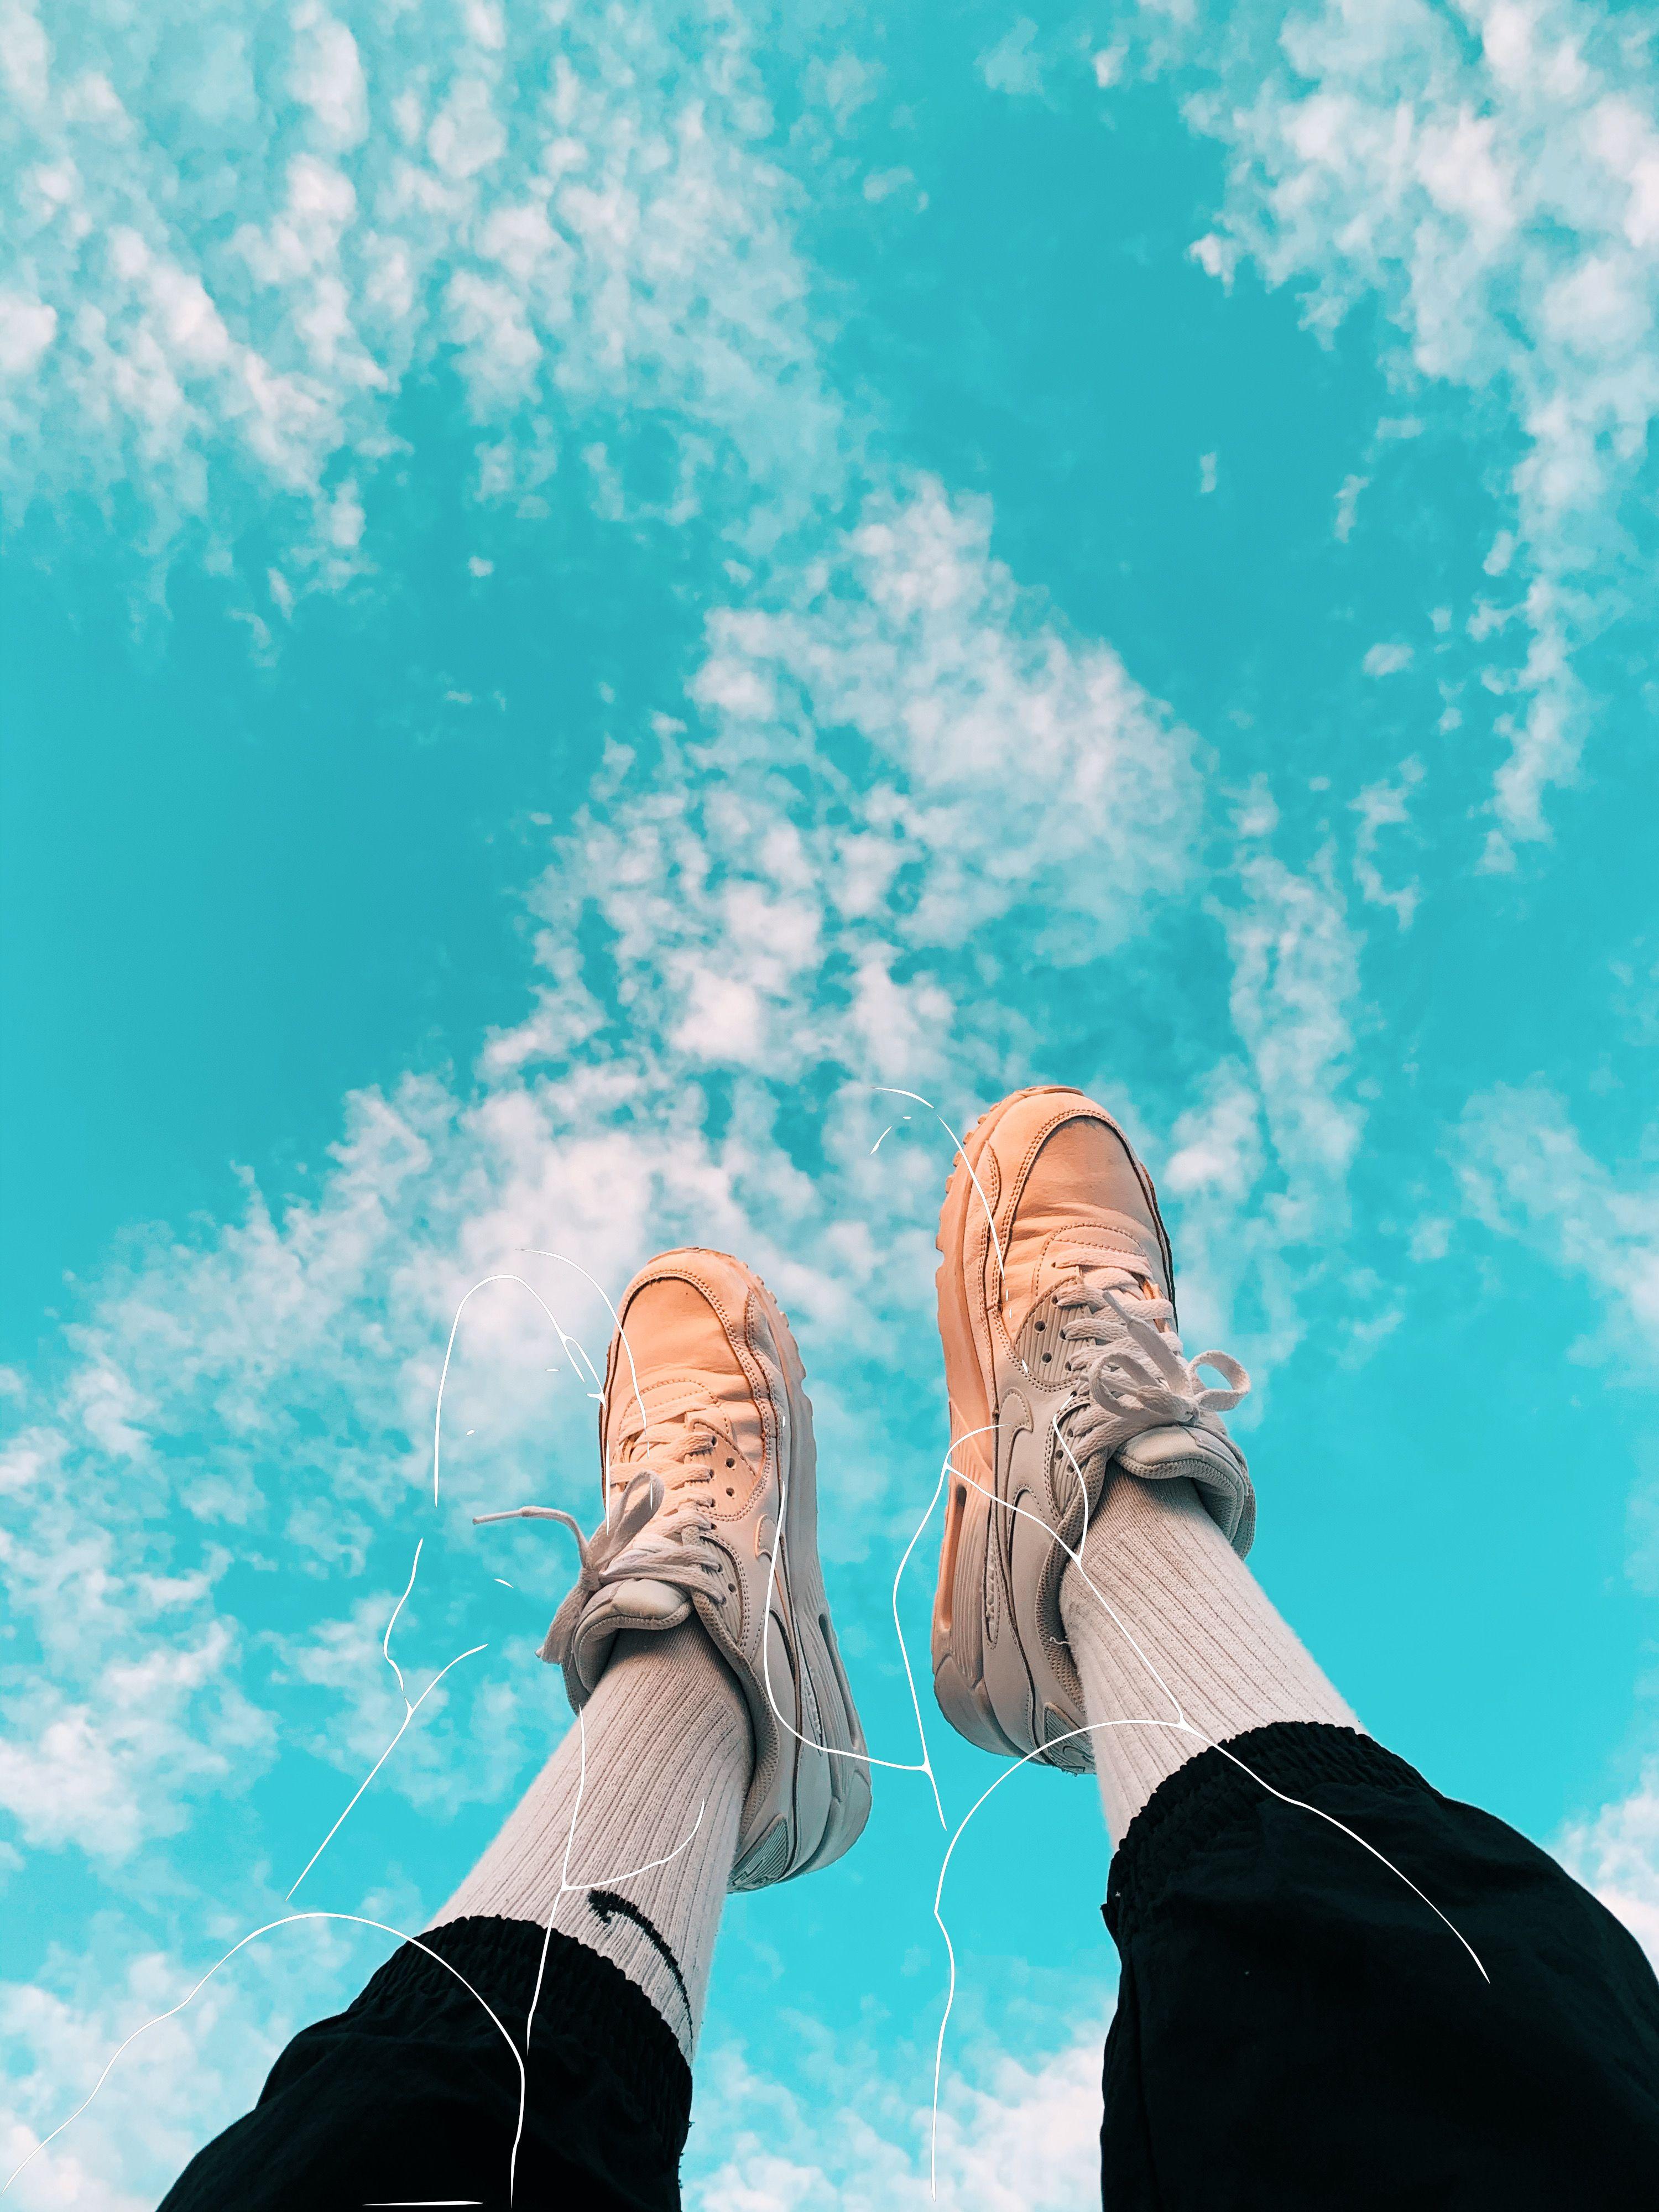 hangin skyshoes in 2020 Sorel winter boot, Winter boot